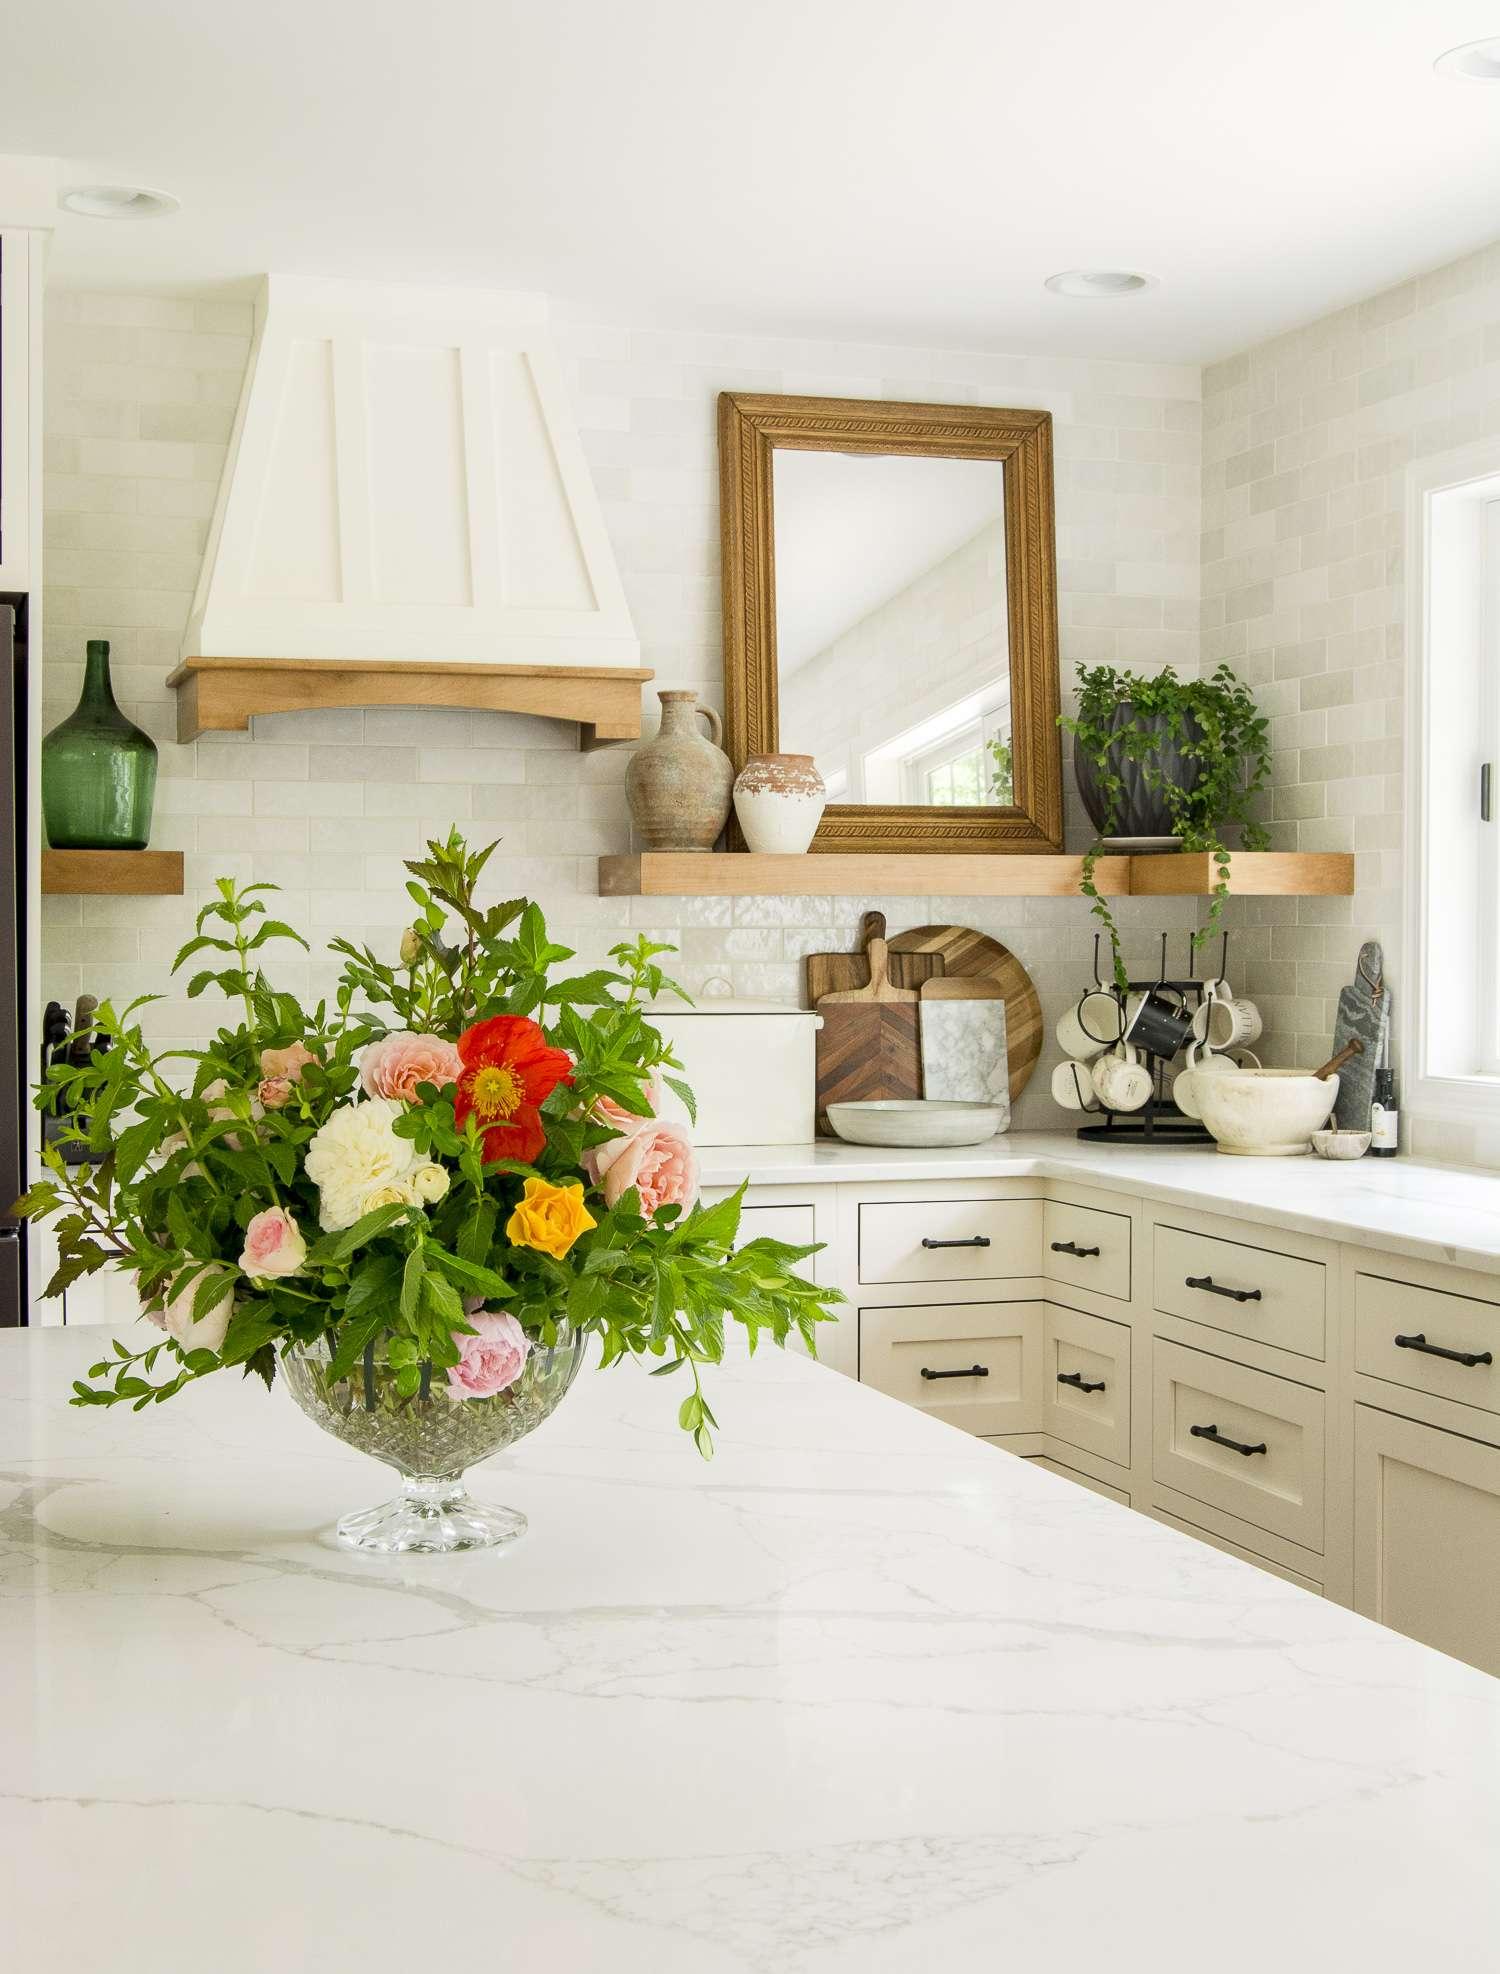 Kitchen backsplash and countertop.